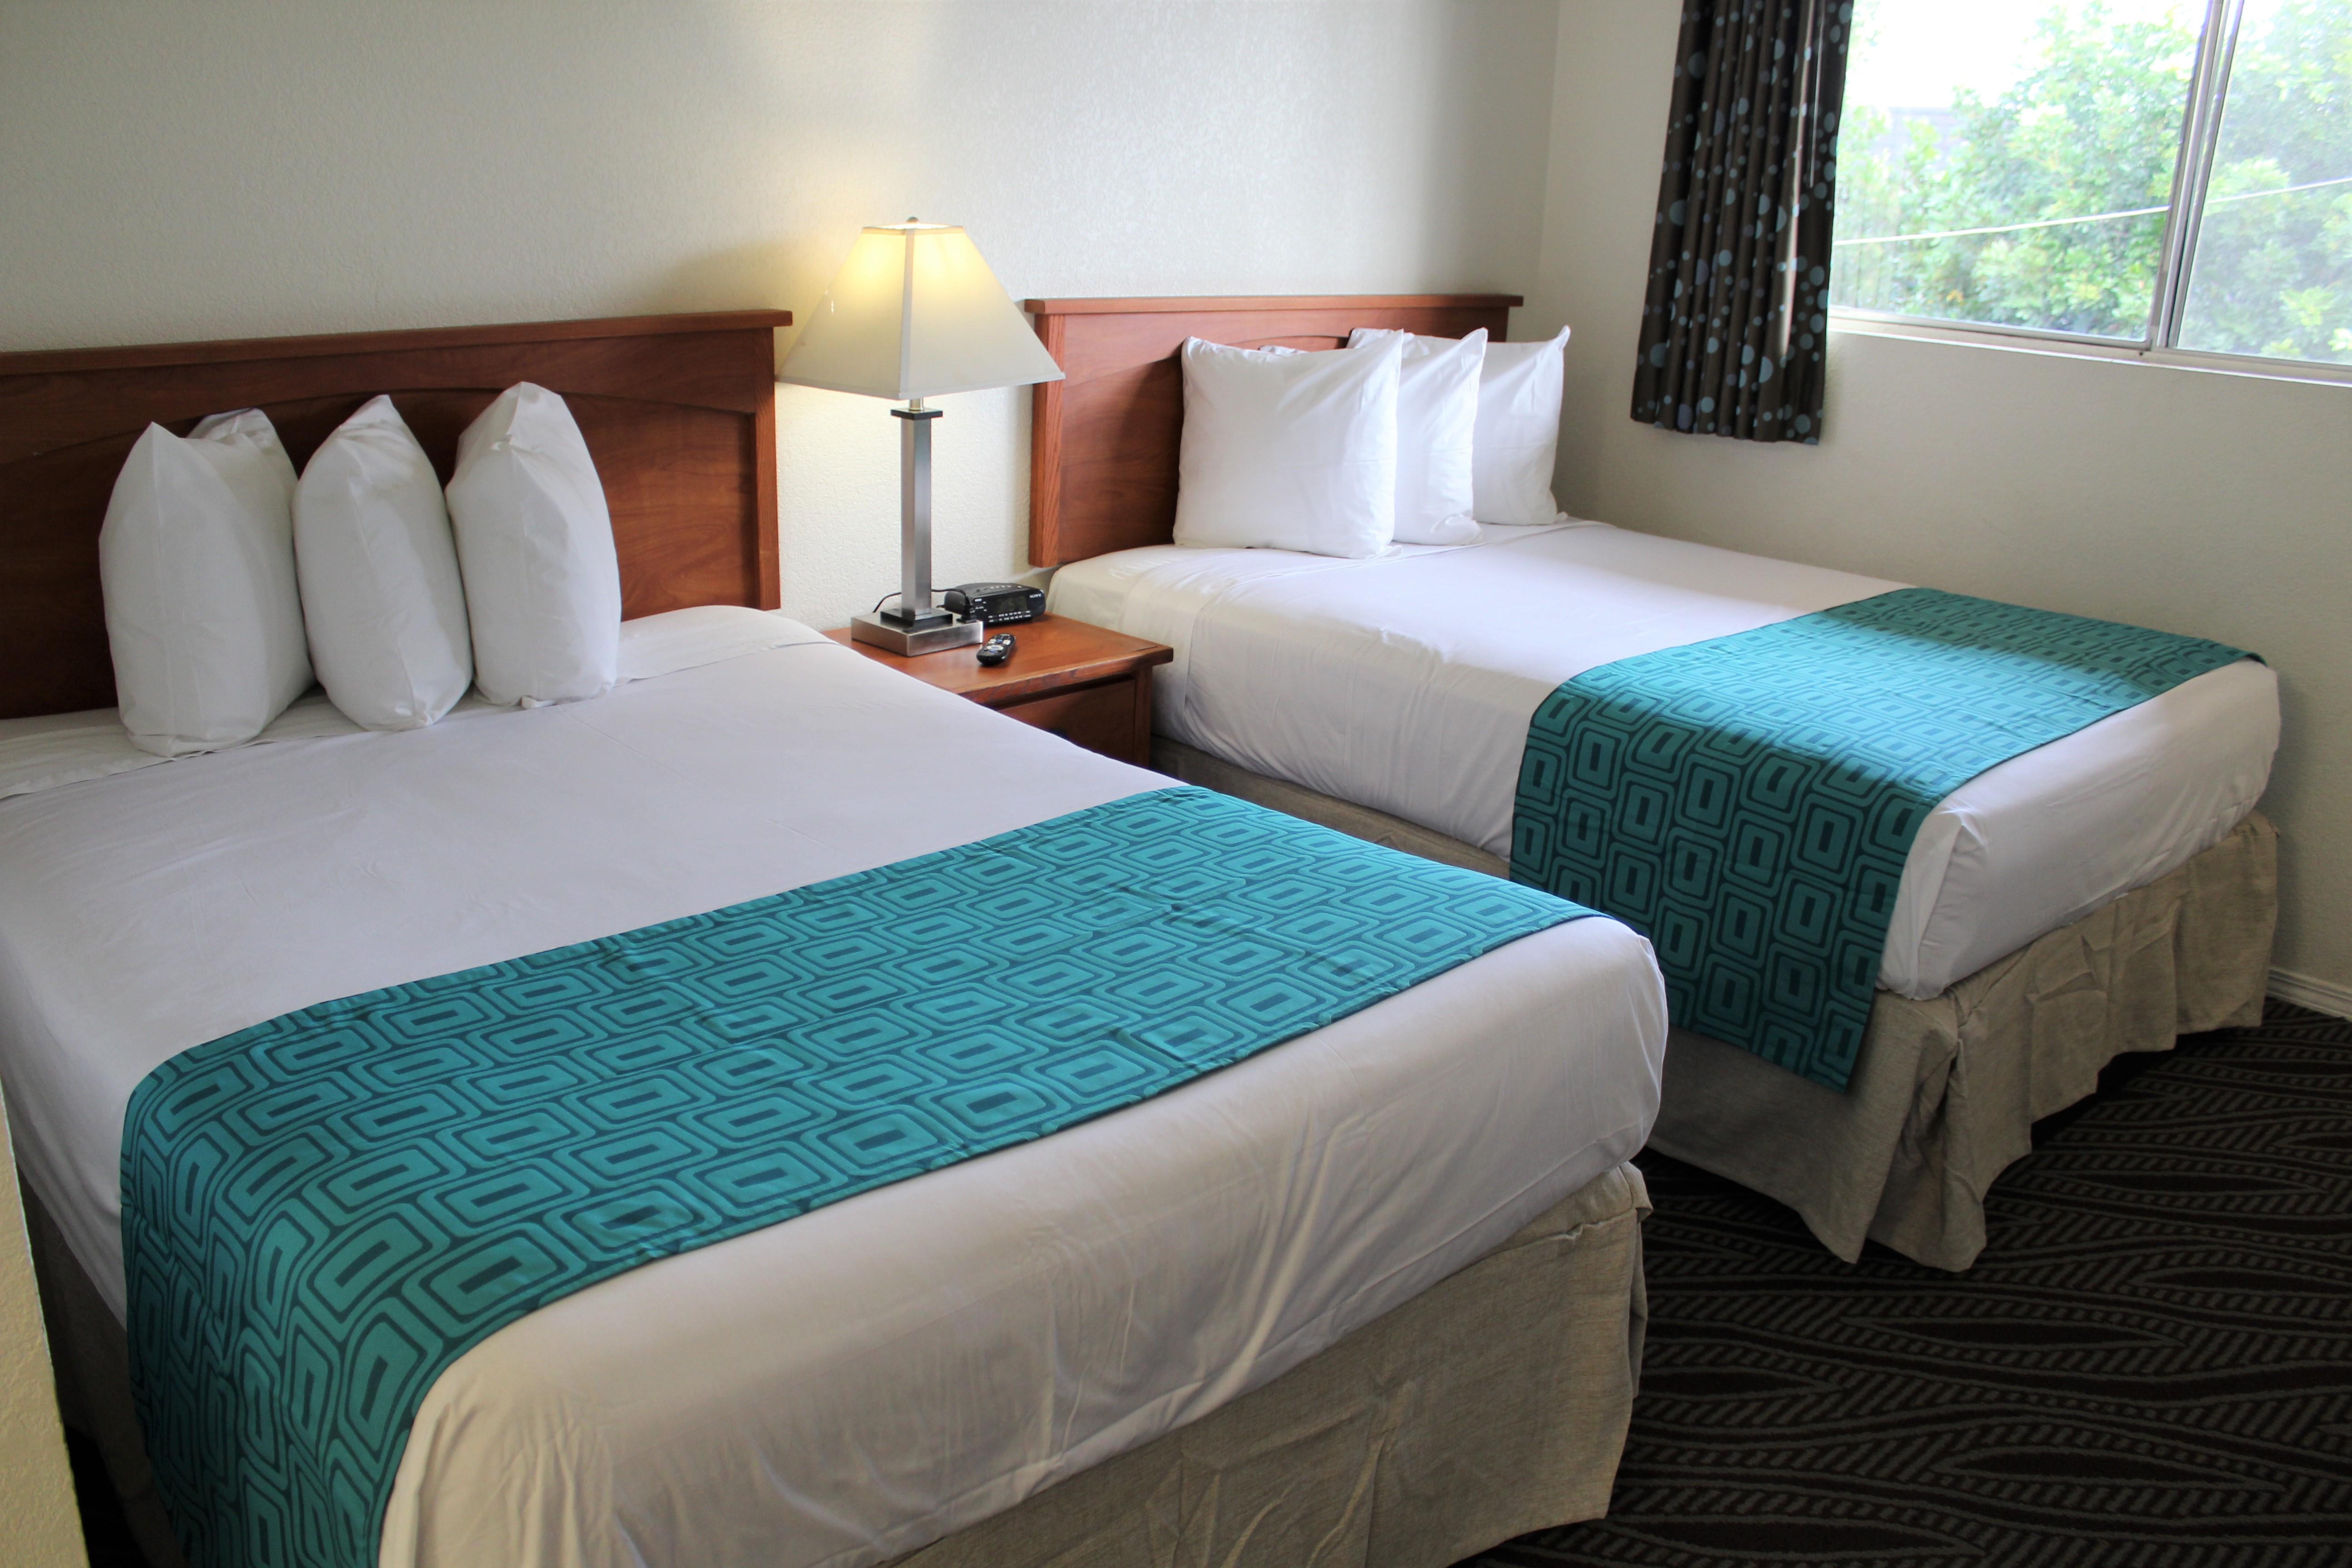 Howard Johnson by Wyndham Chula Vista San Diego Suite Hotel image 1